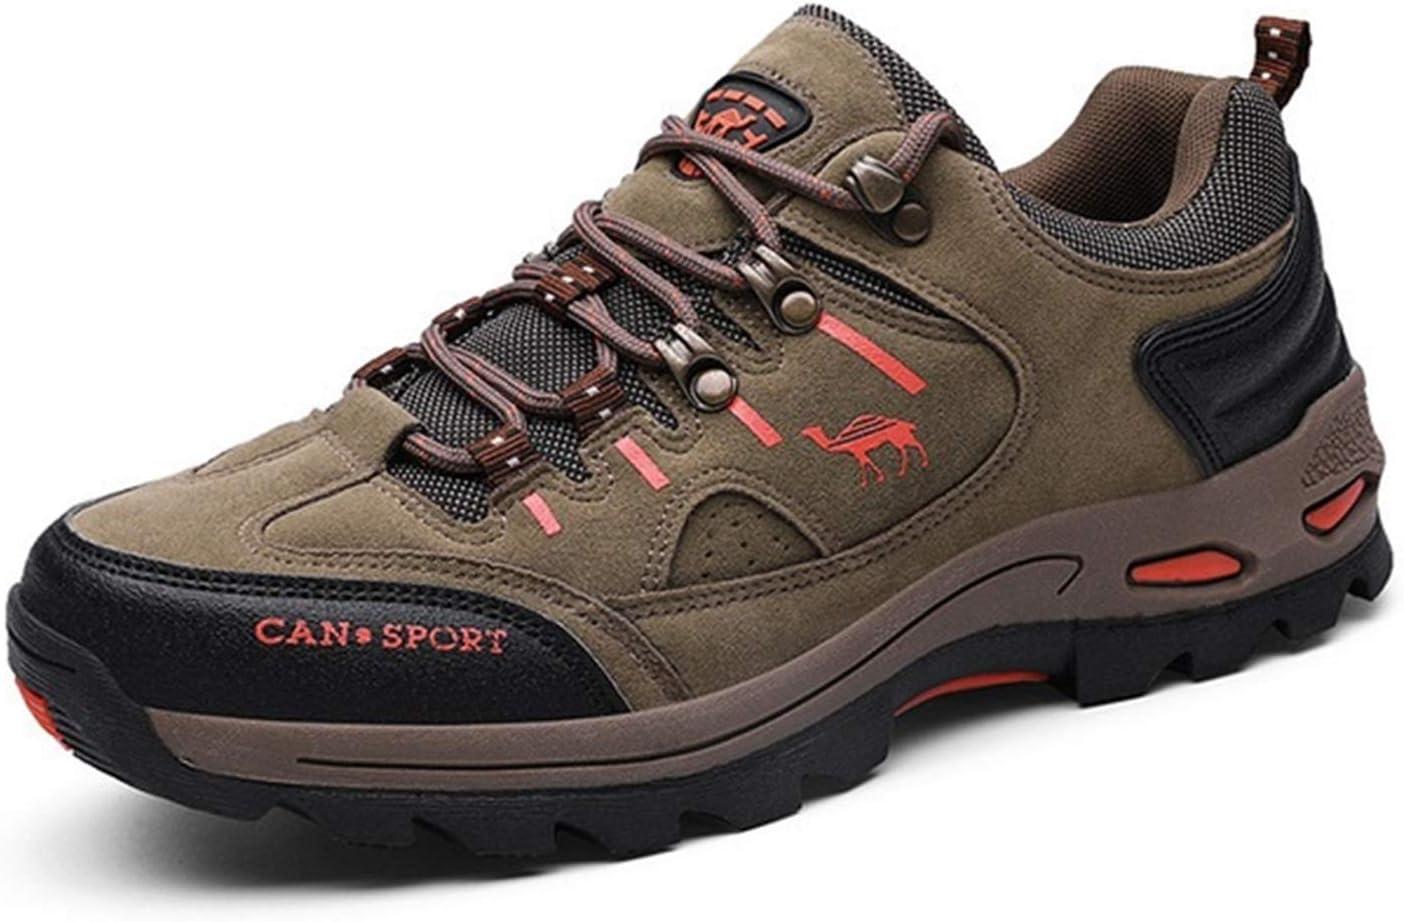 TTKK Special sale item TENGKEJPN Men Hiking Shoes Mens Outdoor excellence Autumn Brand Winter